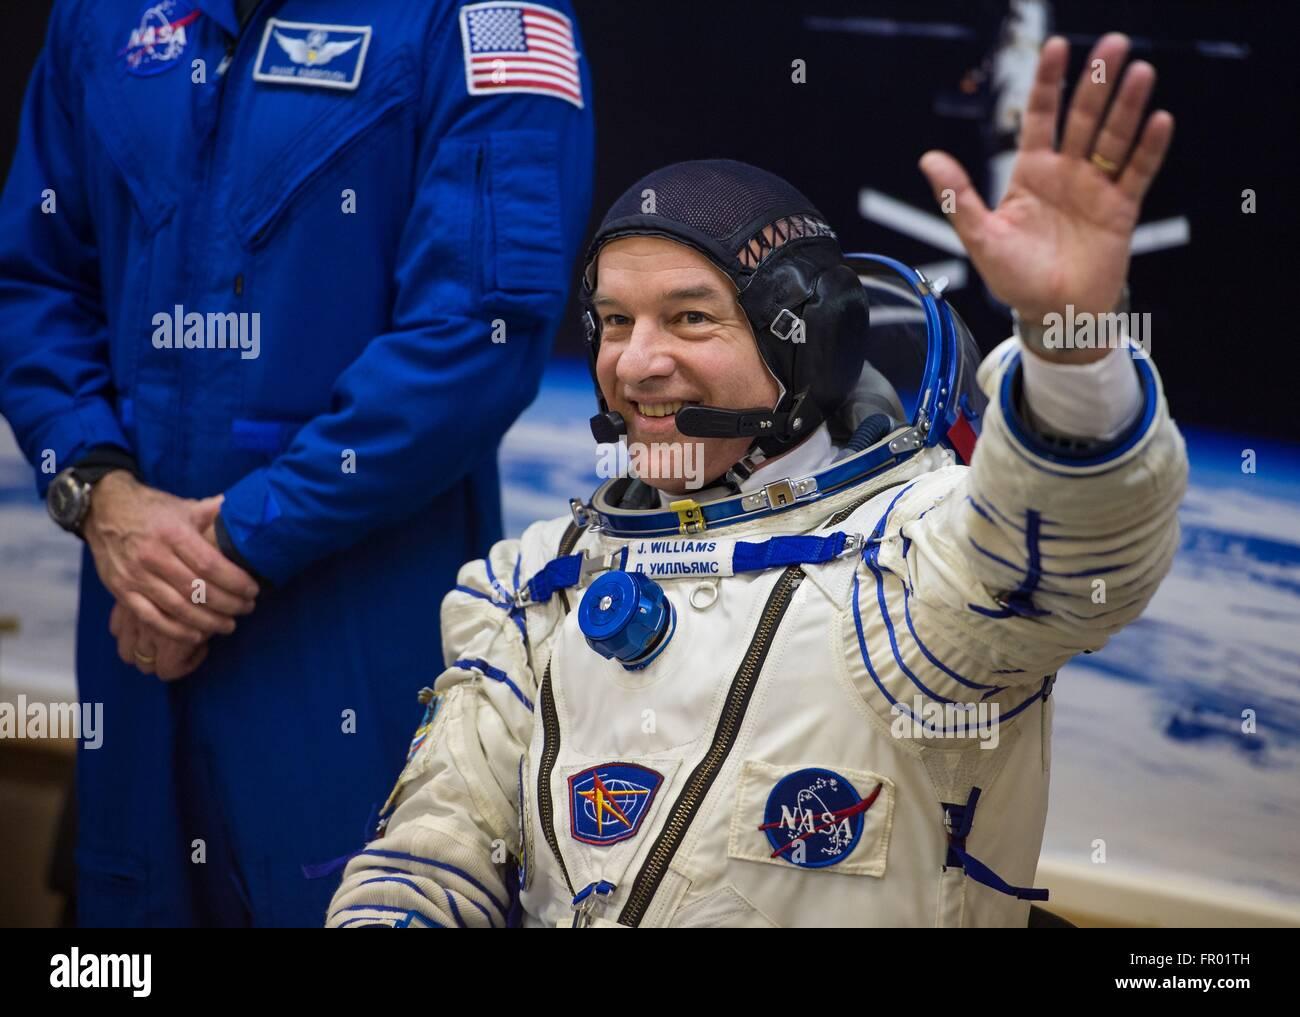 Baikonur, Kazakhstan. 19th Mar, 2016. American astronaut Jeff Williams waves to family members during final pressure - Stock Image